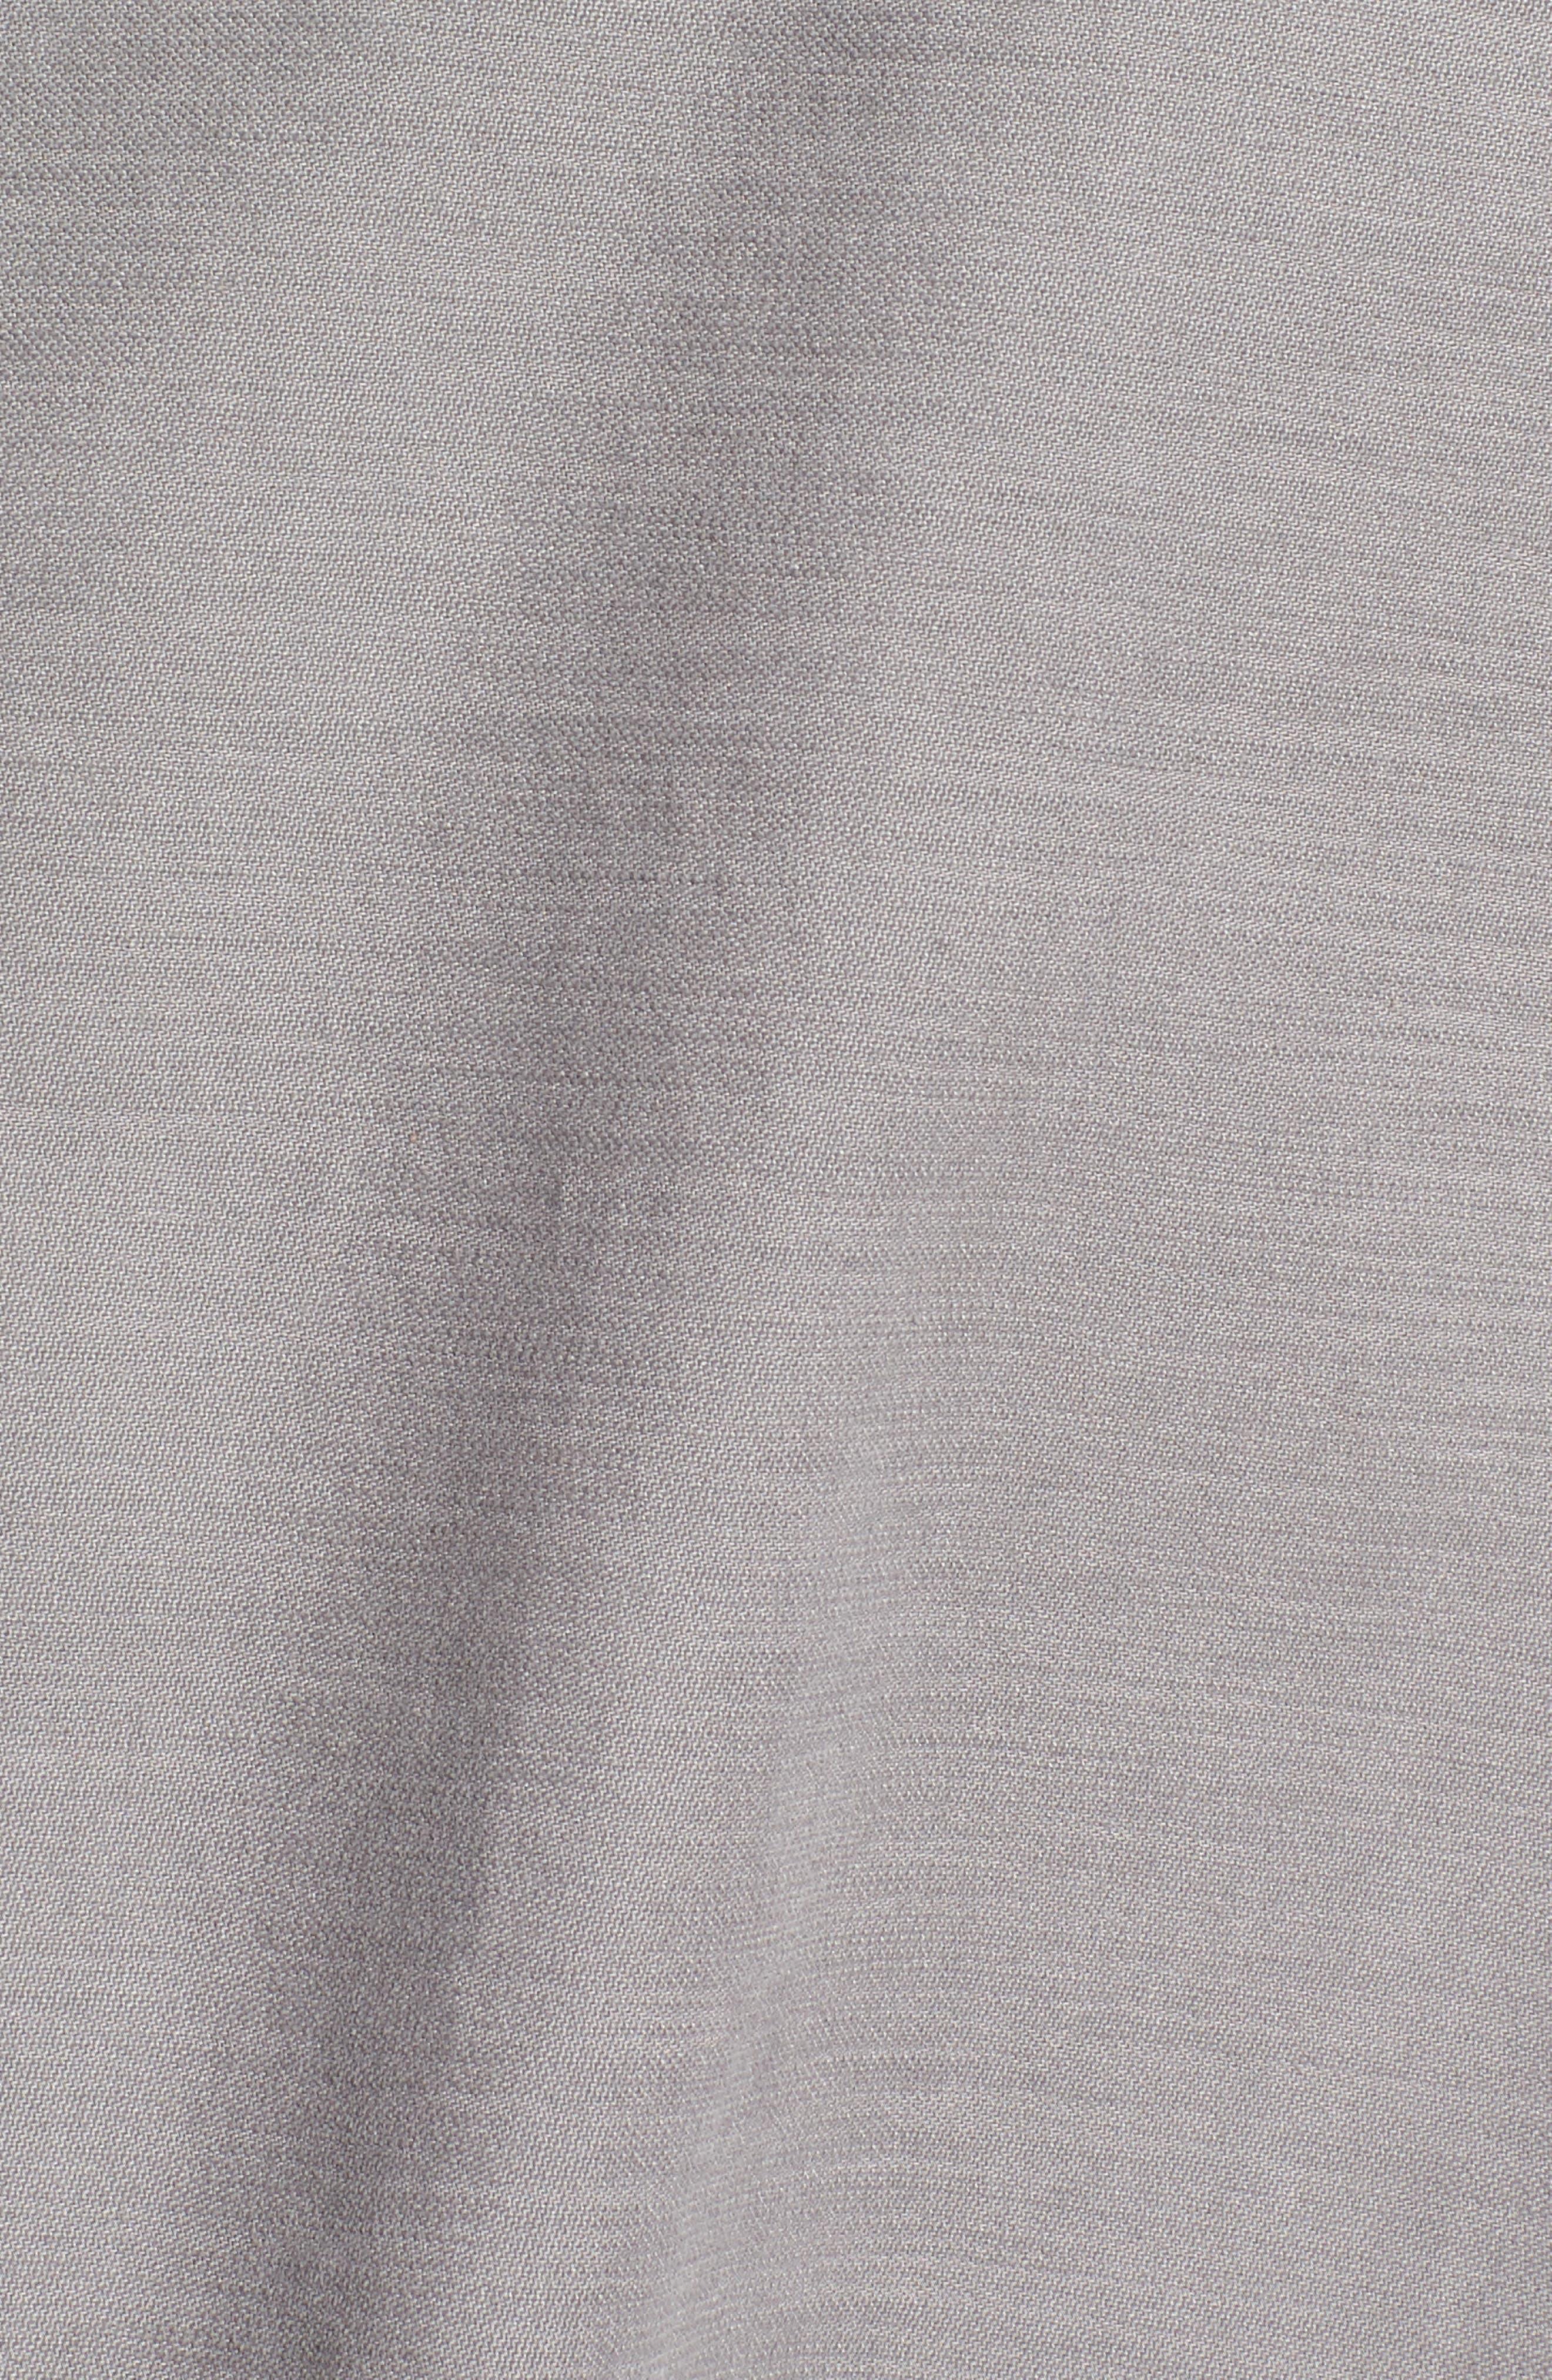 Cotton 4-Pocket Jacket,                             Alternate thumbnail 7, color,                             030